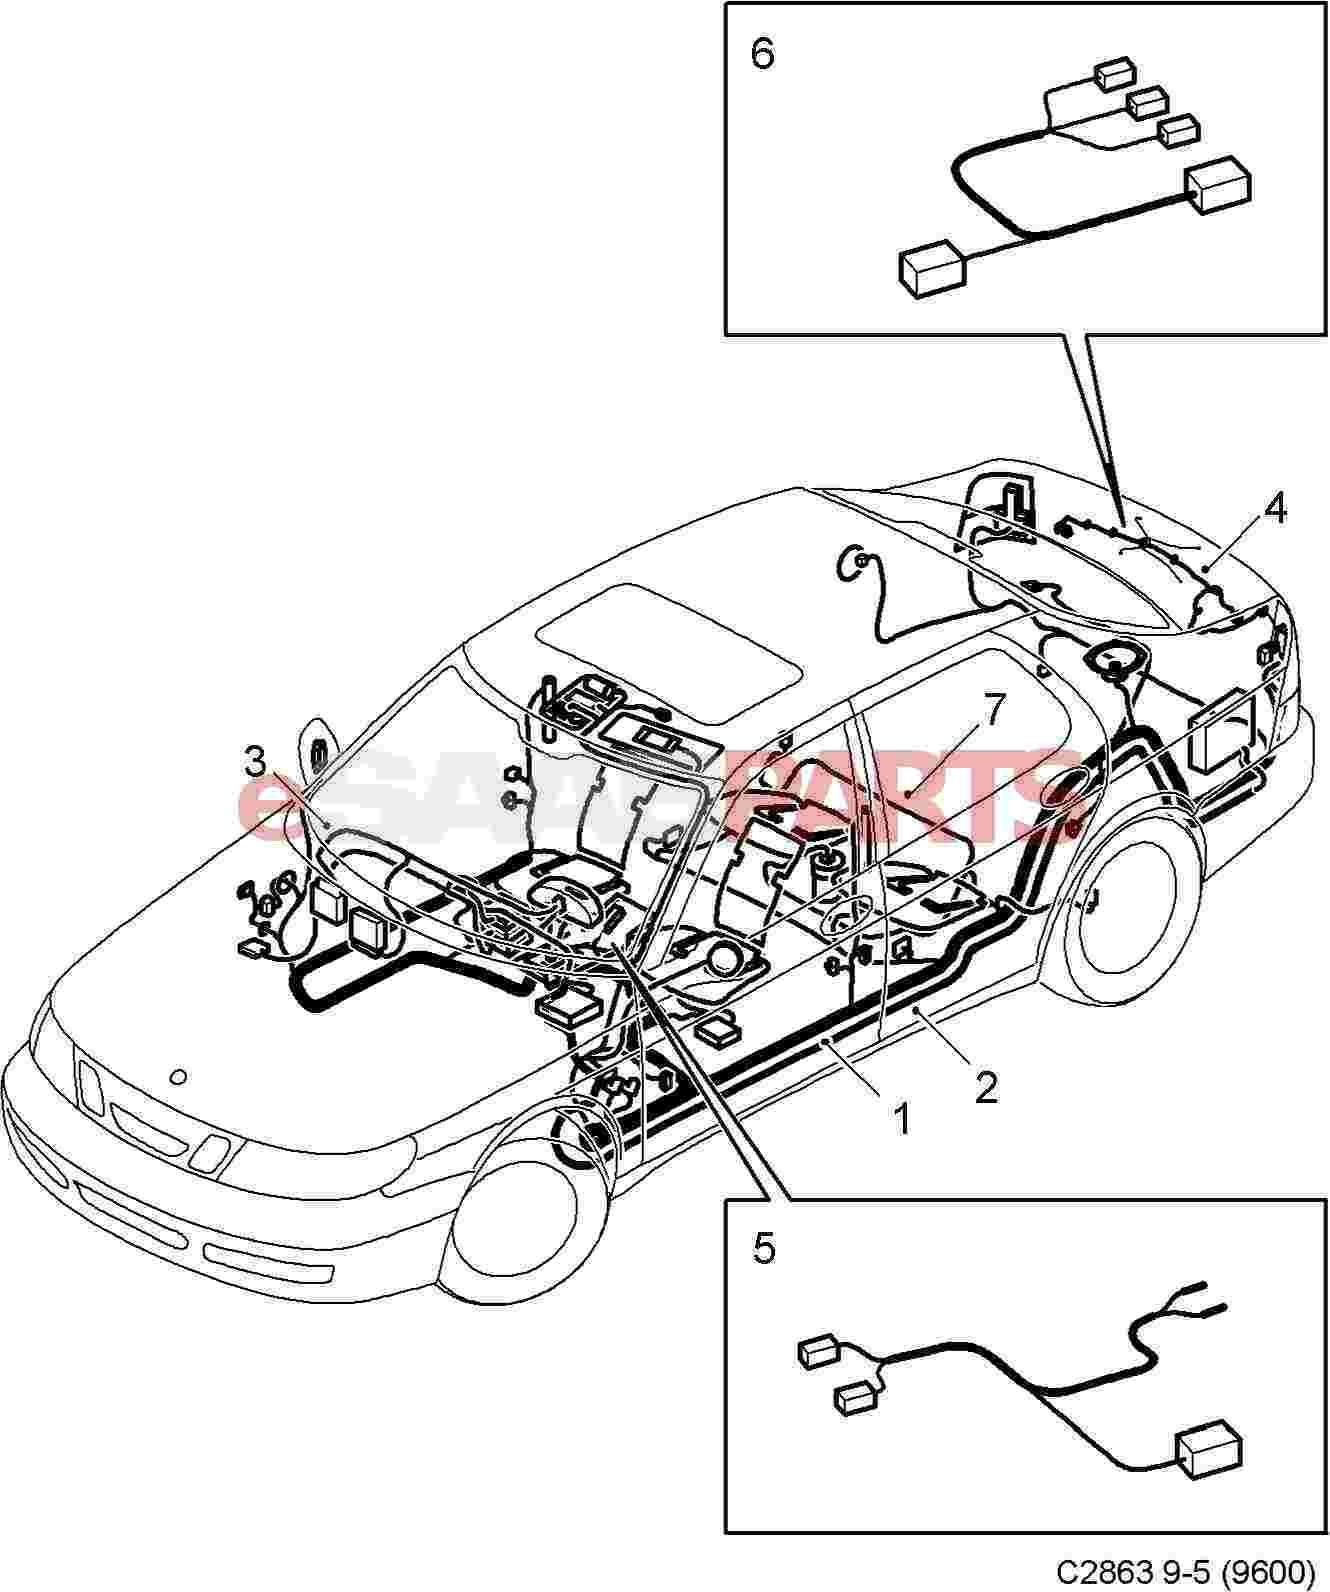 Saab Body Wiring Harness